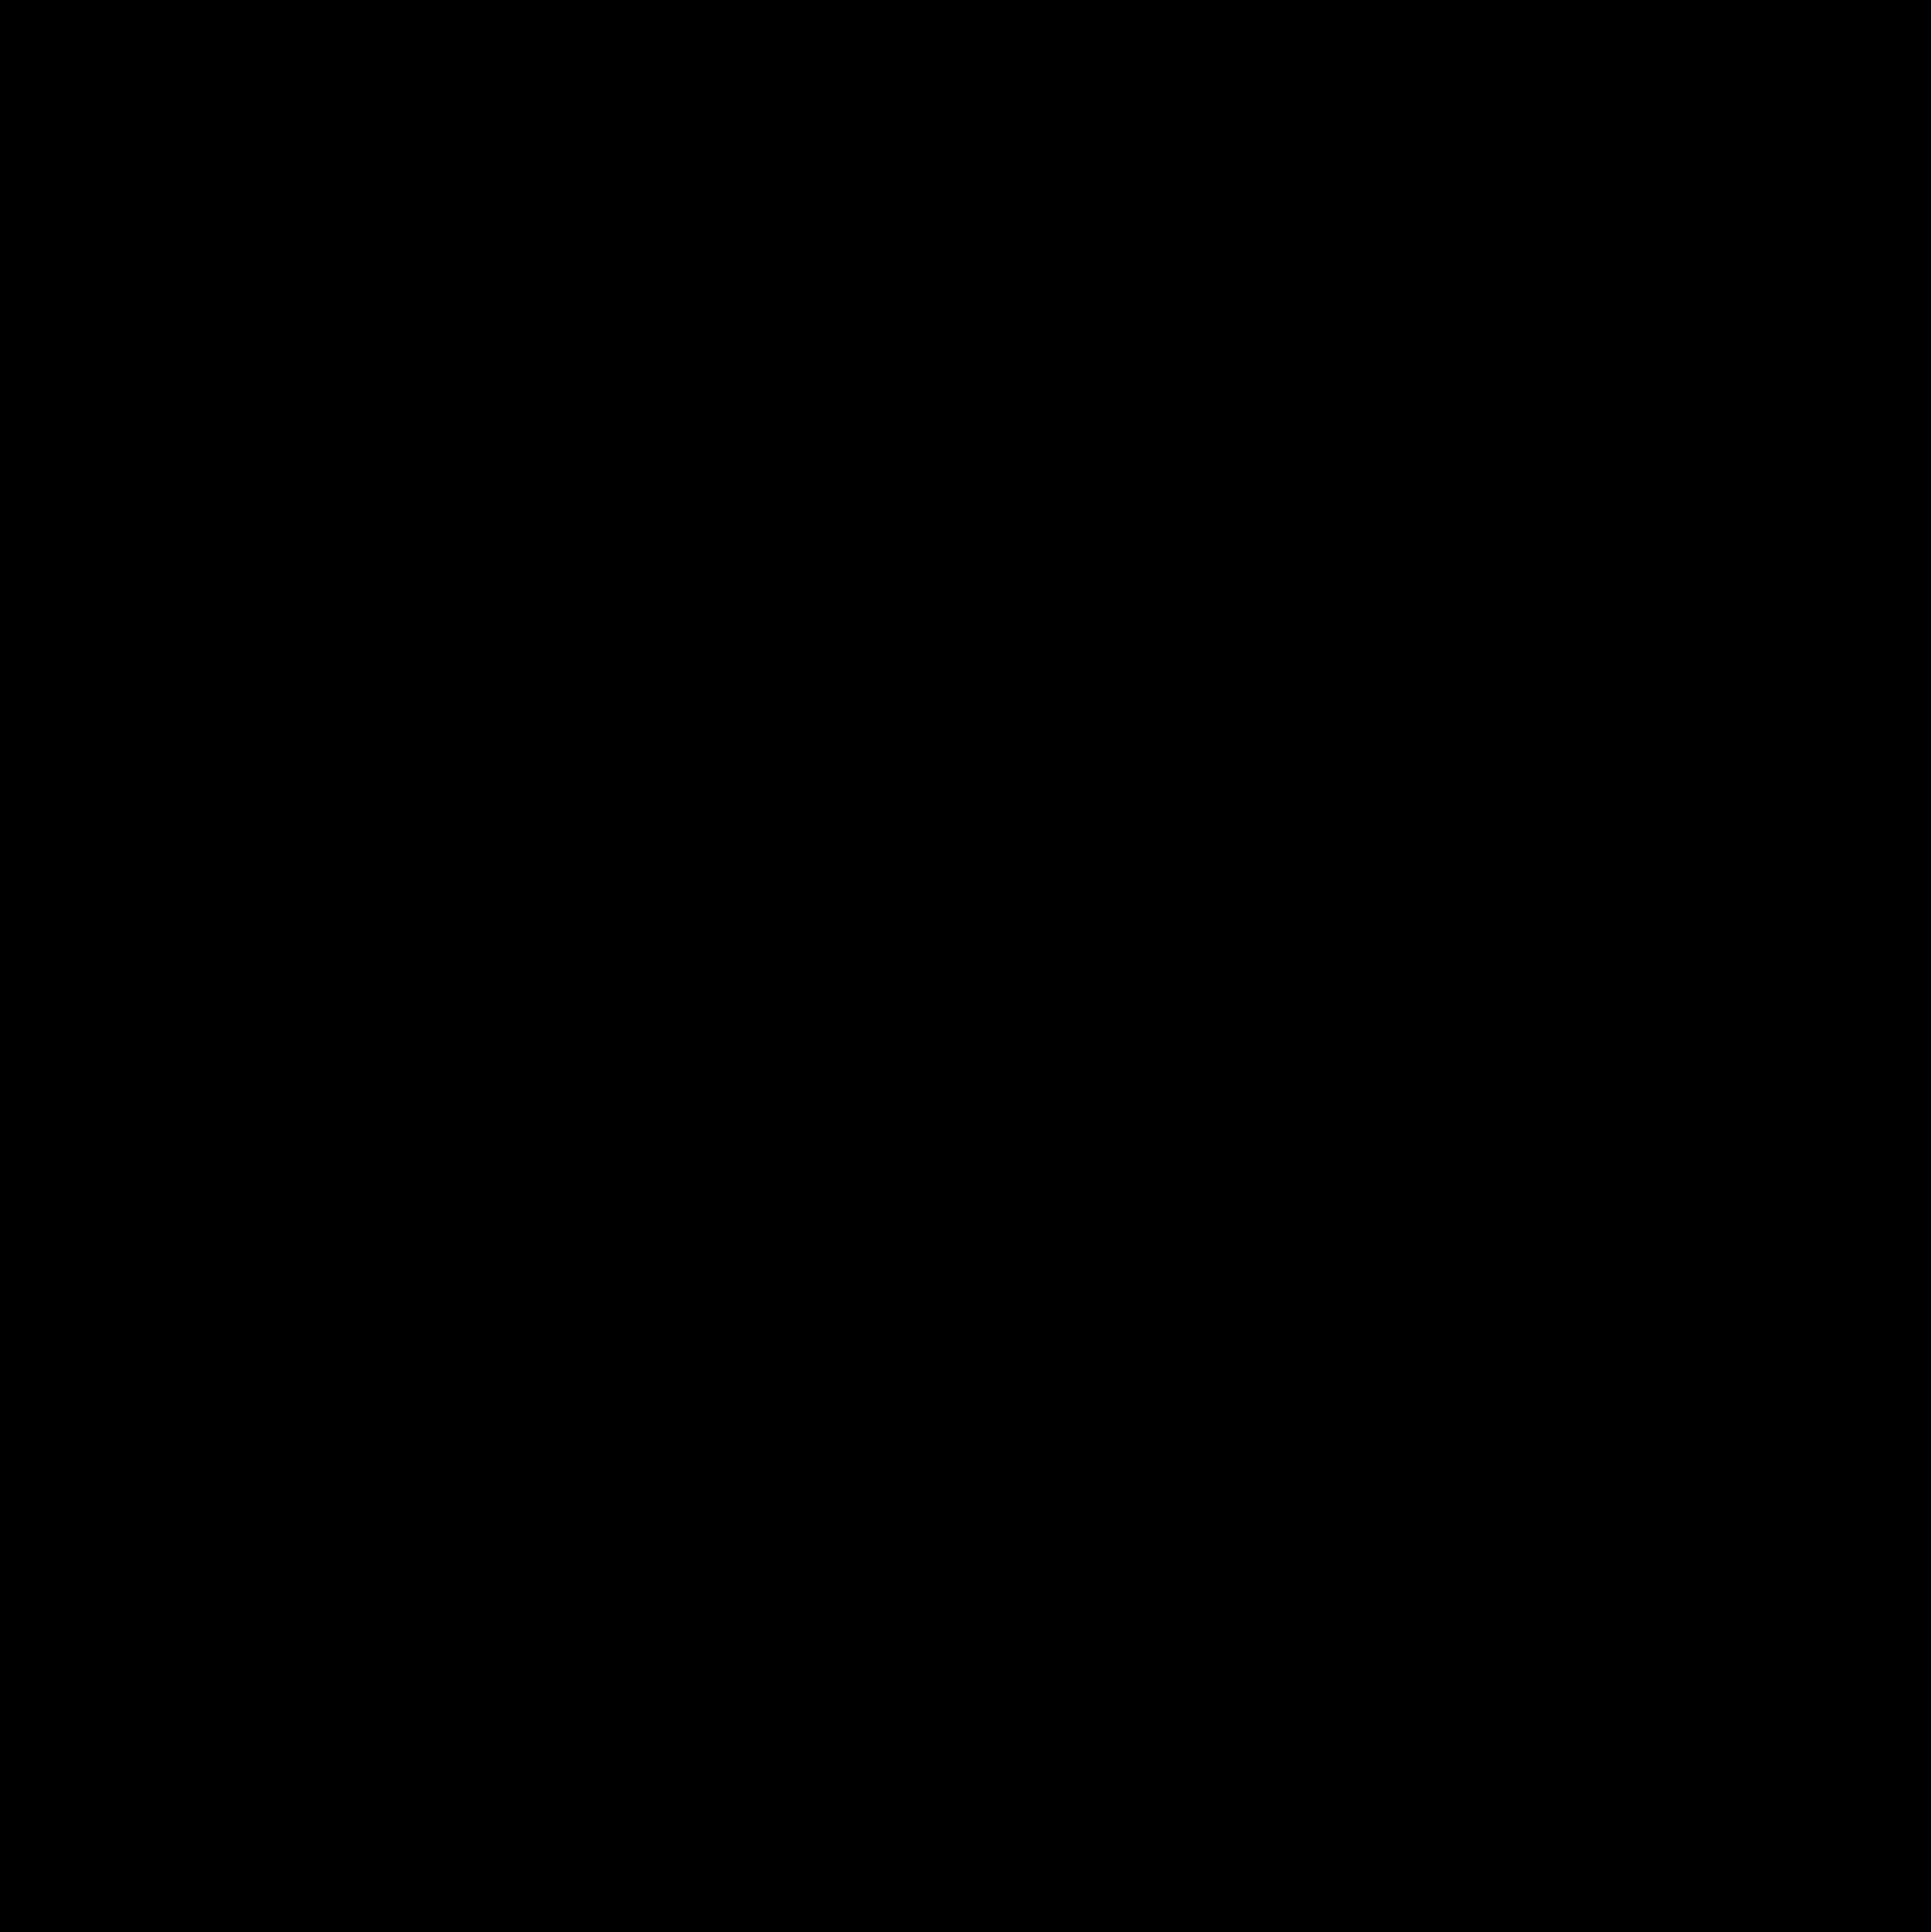 MM_logo-02-03.png